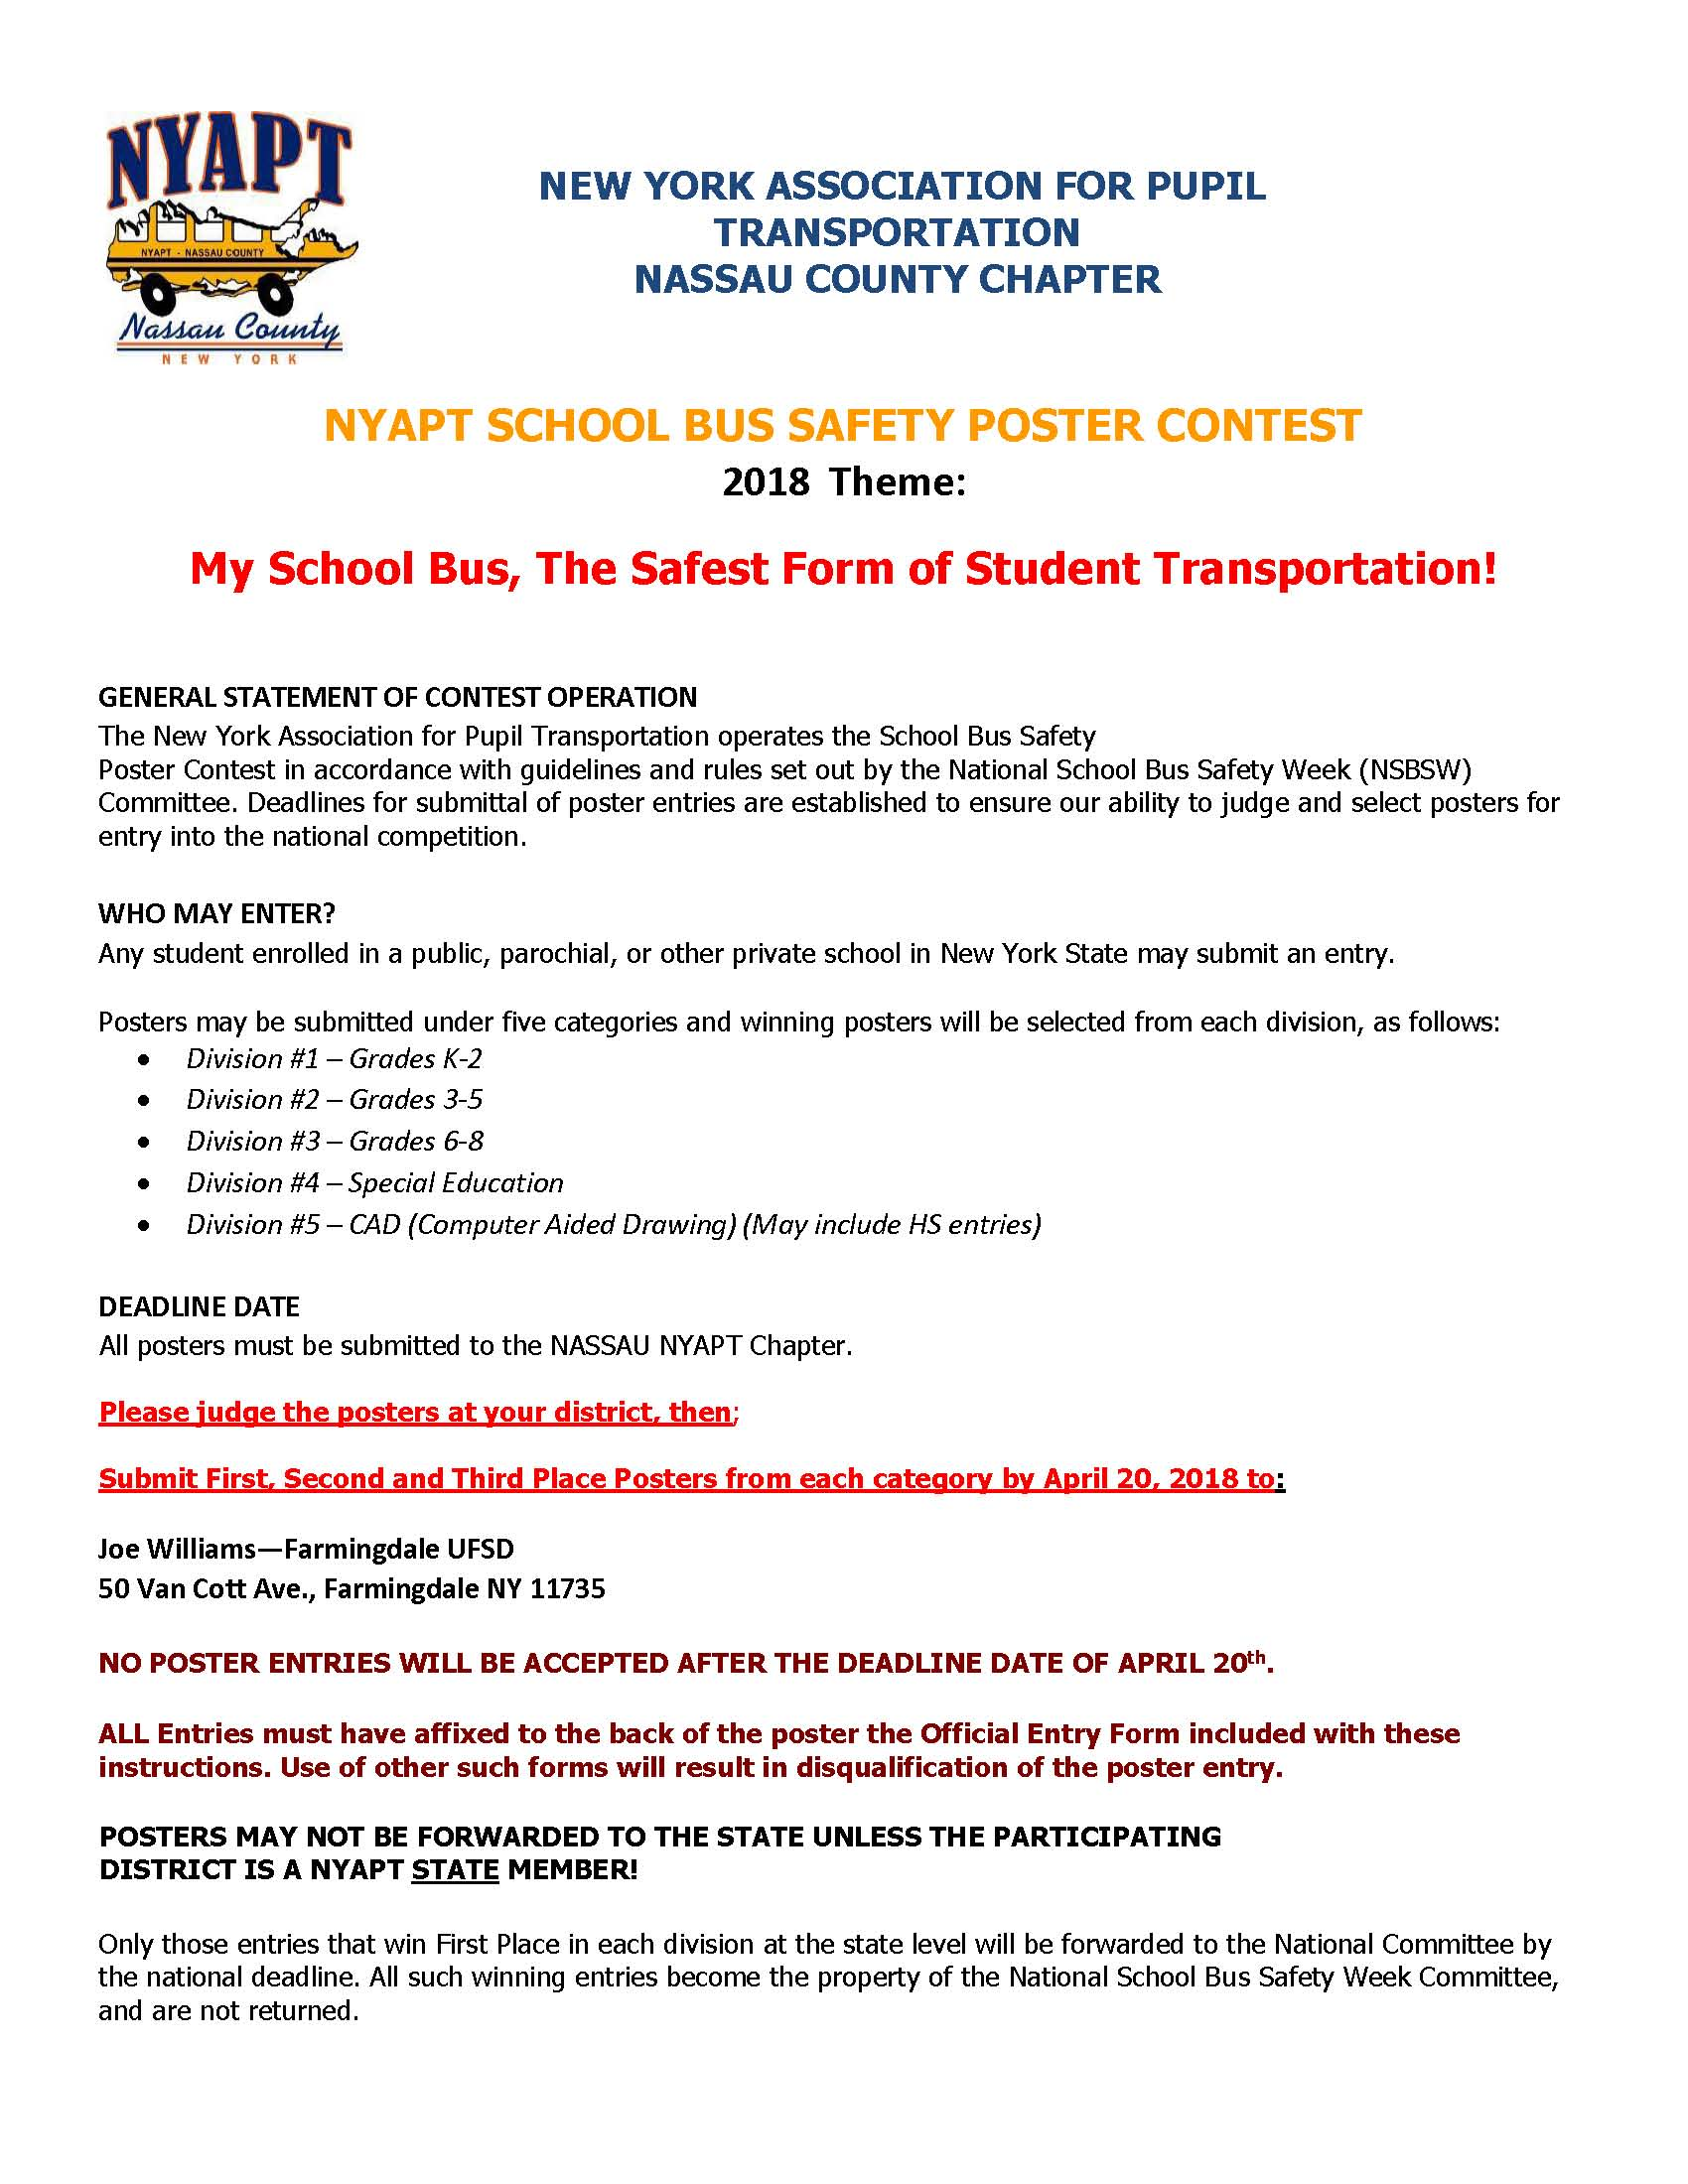 Nassau NYAPT Poster Contest 17-18